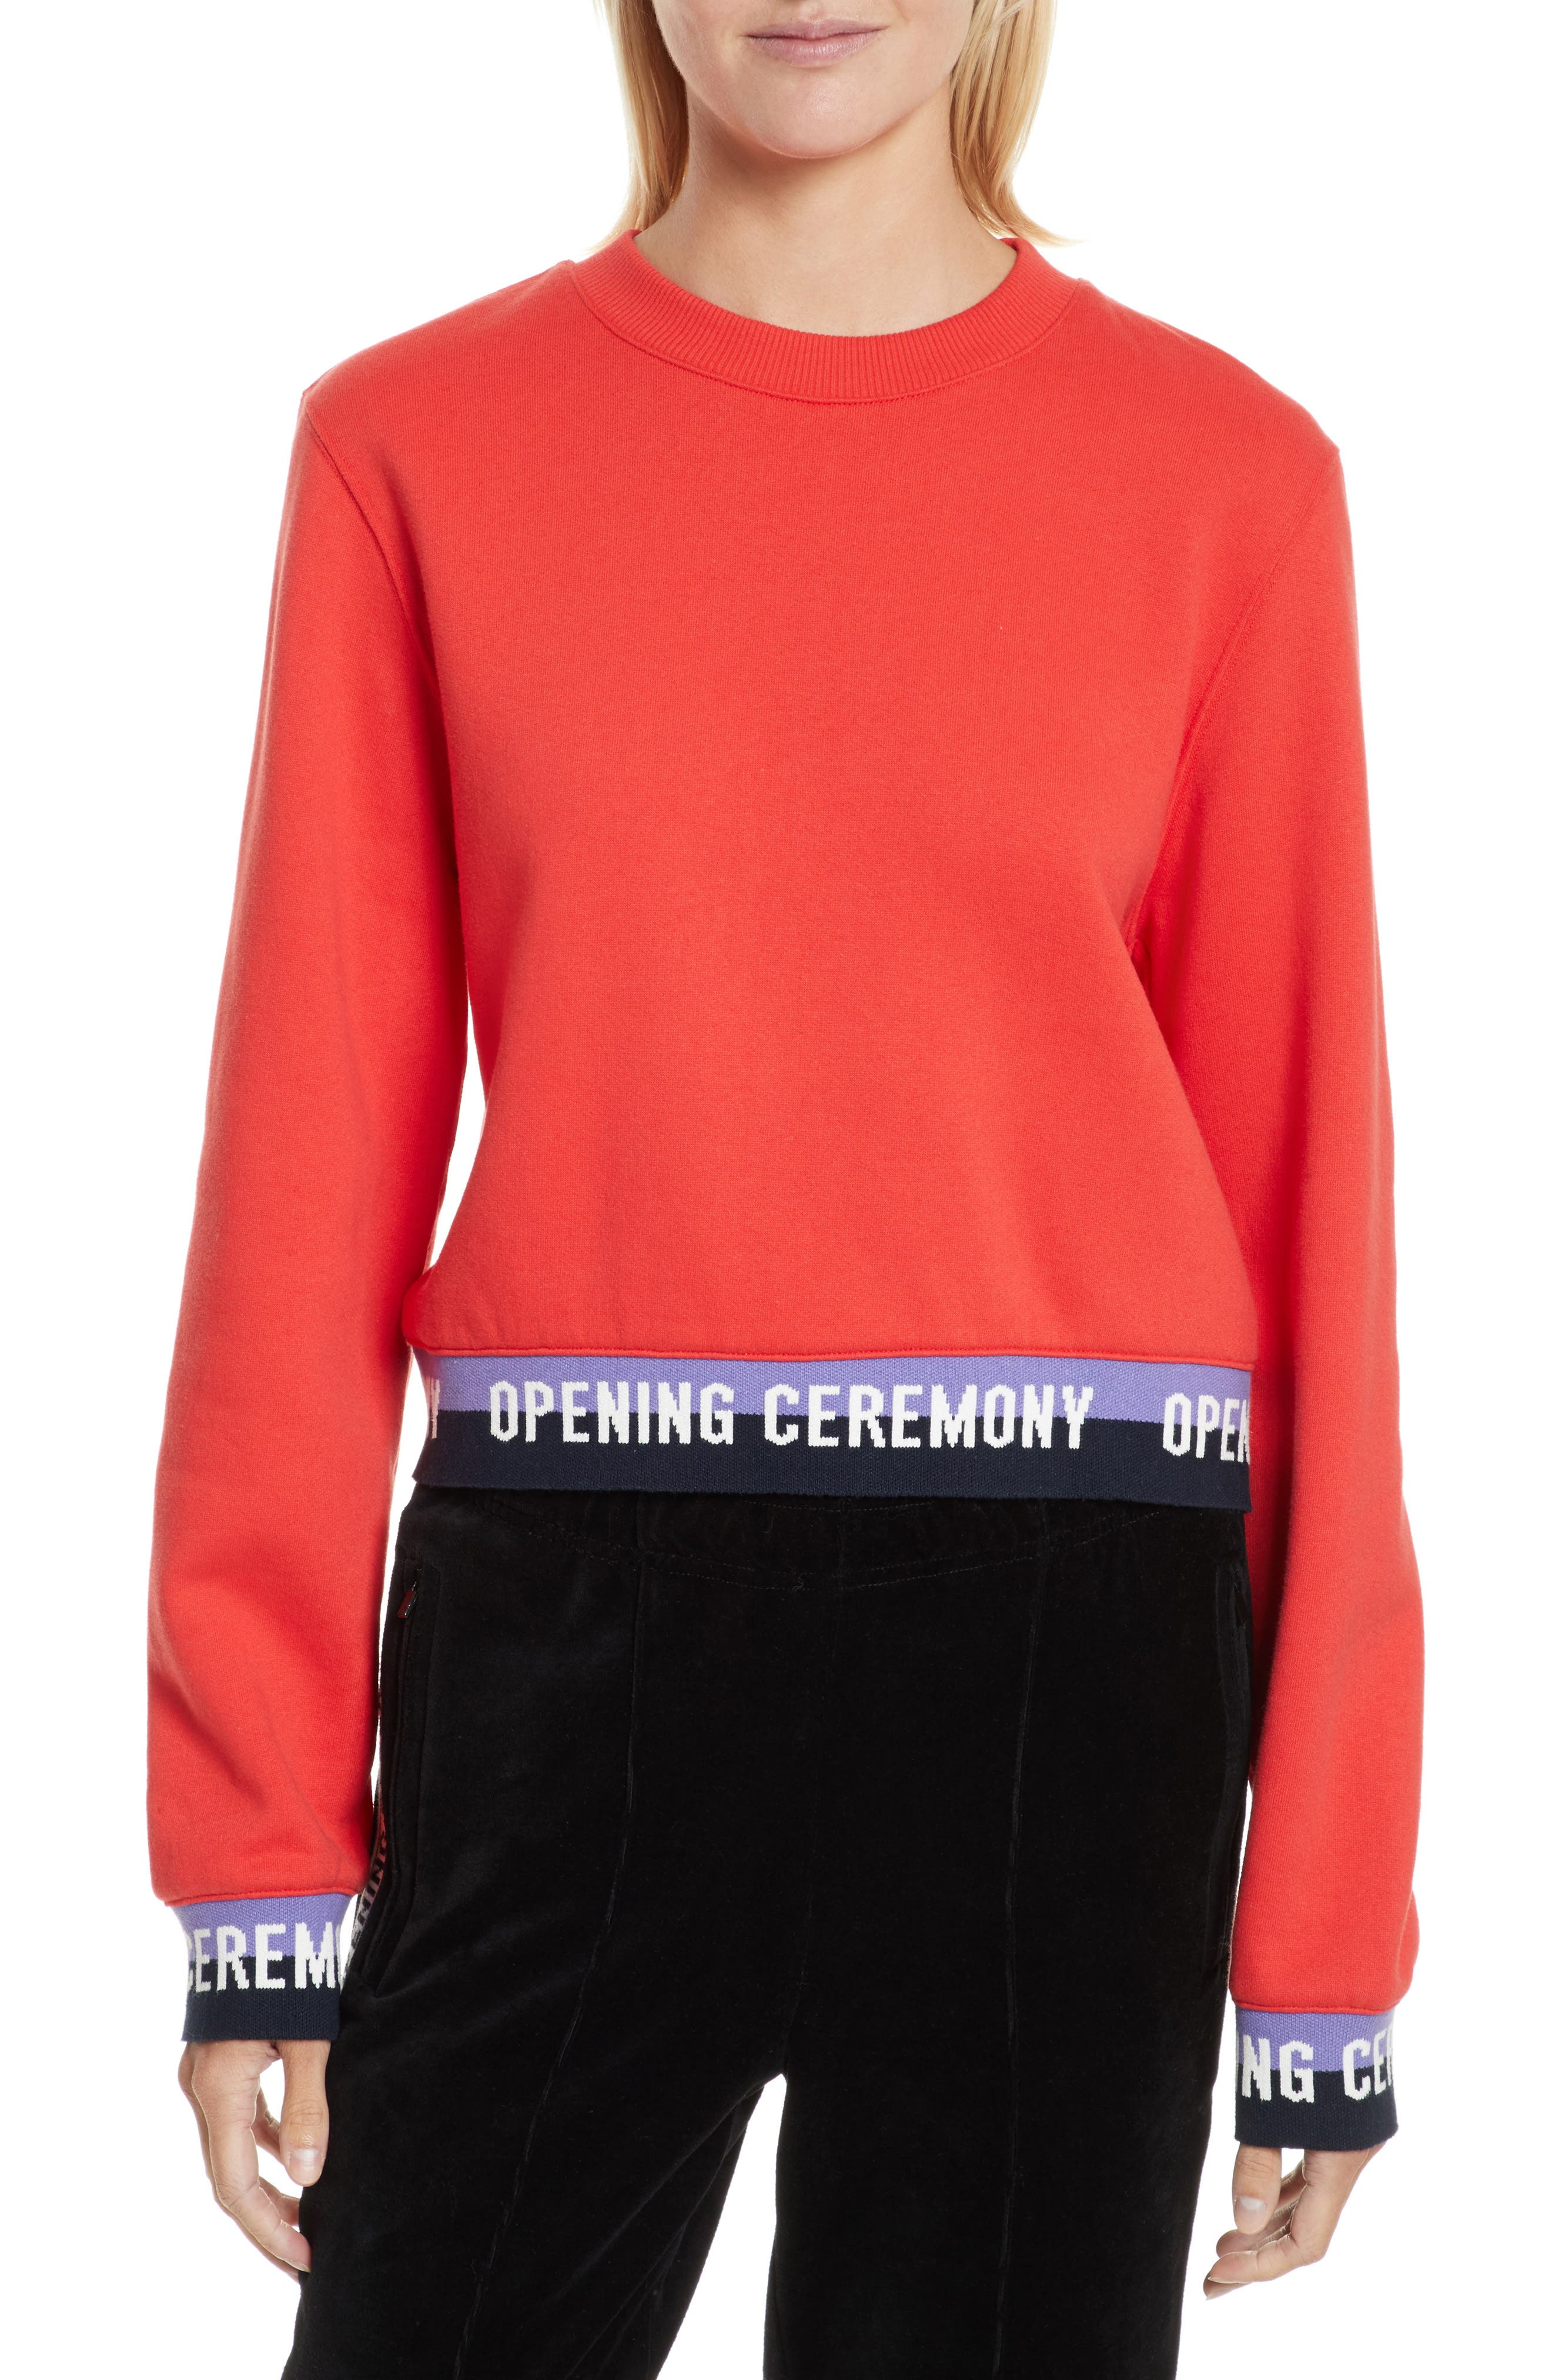 Alternate Image 1 Selected - Opening Ceremony Elastic Logo Crop Sweatshirt (Limited Edition)